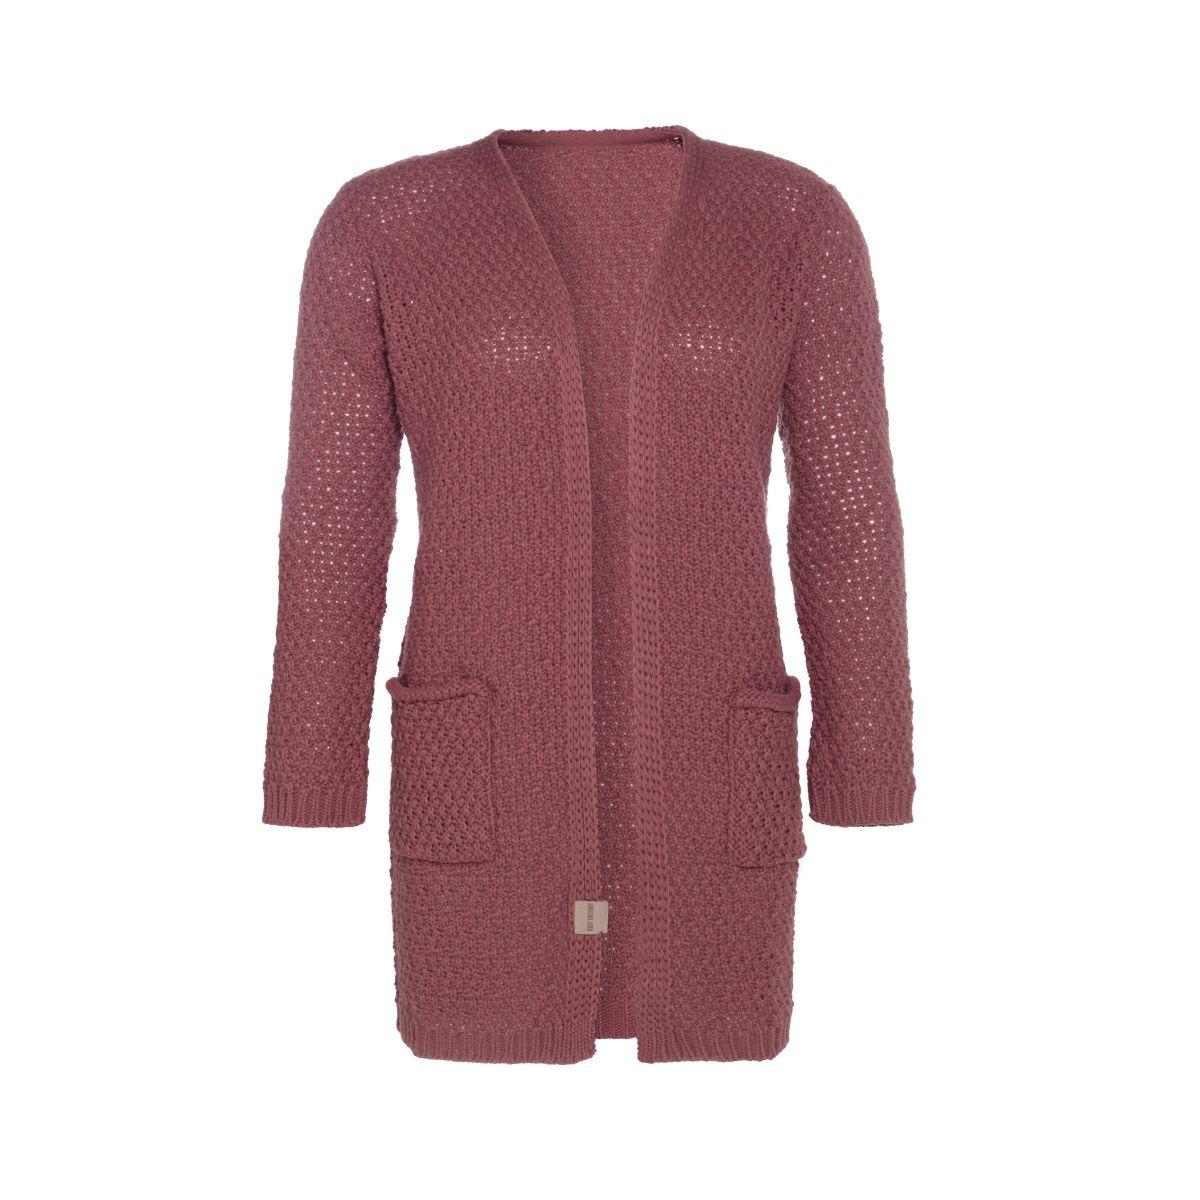 knit factory kf13308103851 luna vest stone red 4042 1